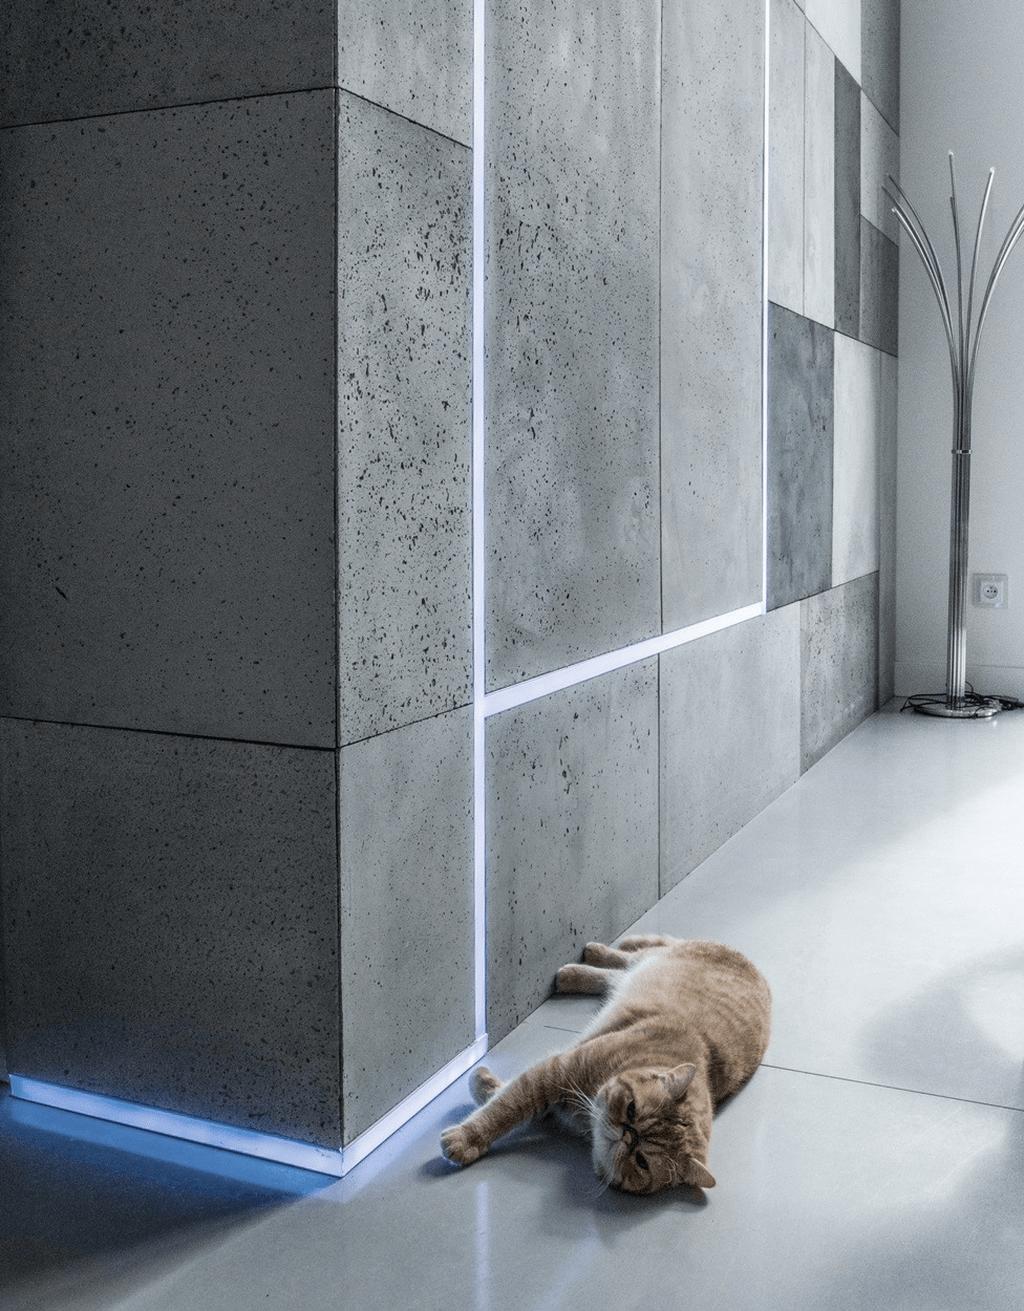 Tiles Design For Living Room Wall: 36 Lovely Tile Wall For Living Room Decorations